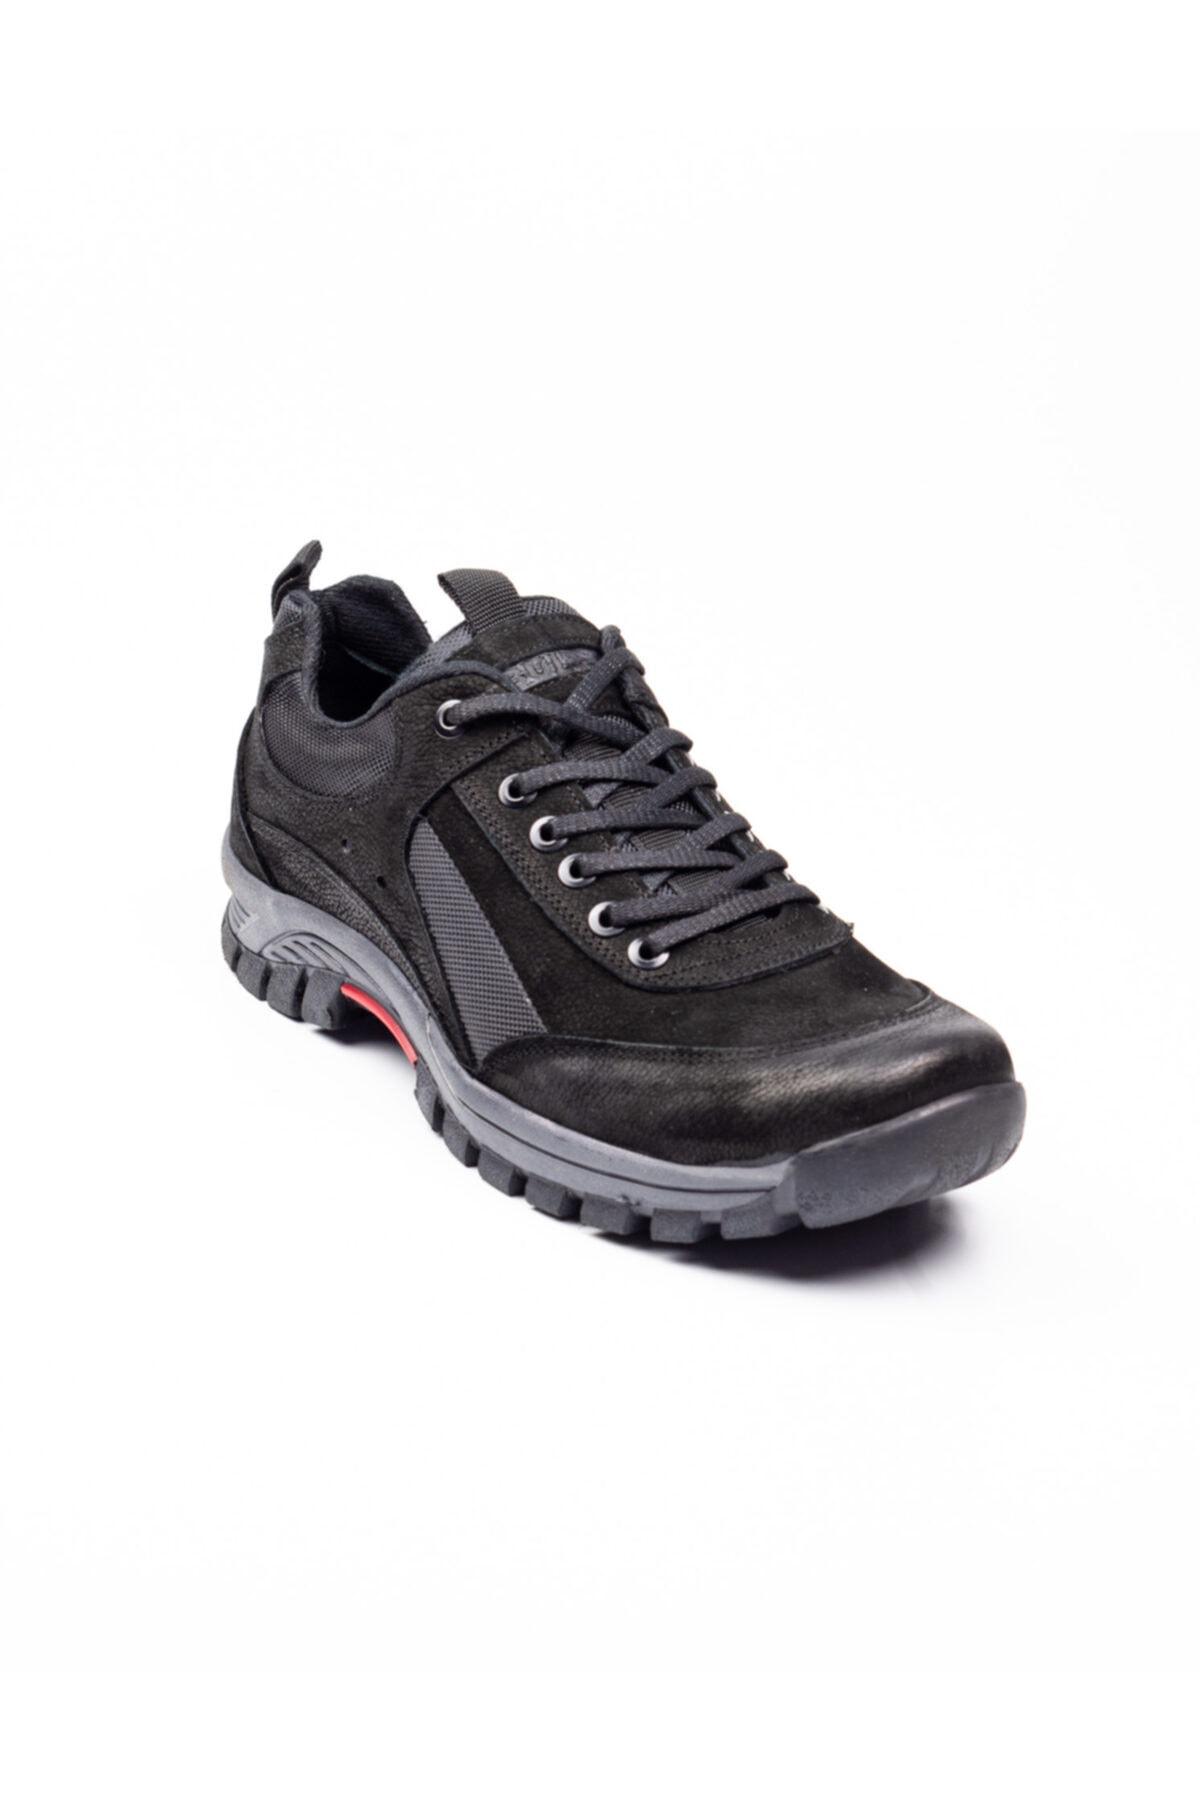 Bulldozer Siyah Erkek Outdoor Ayakkabı Siyah-44 200130 1